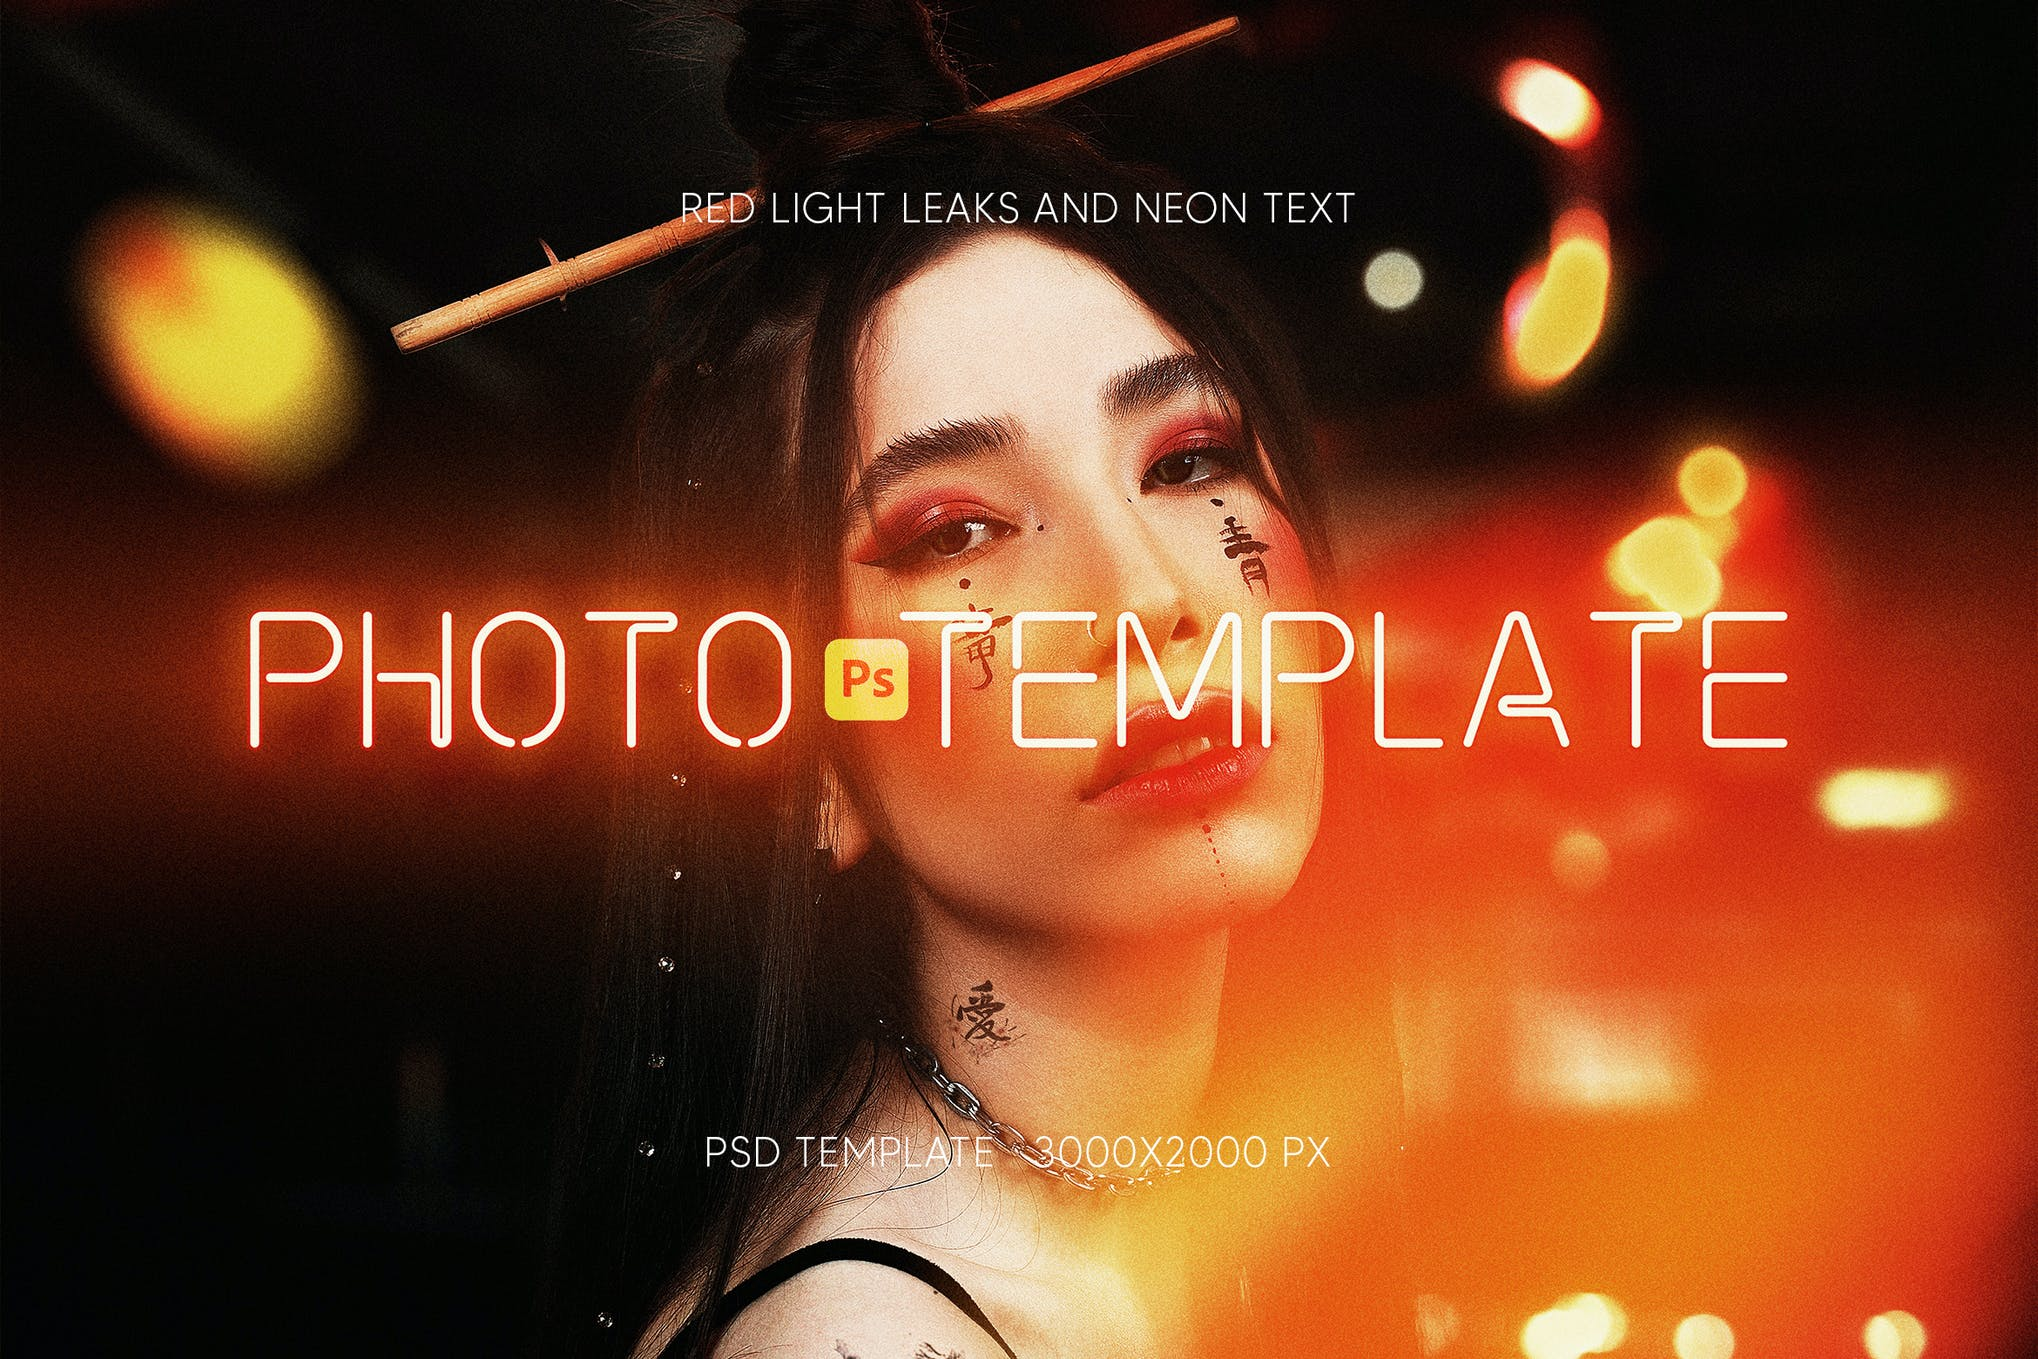 photoshop efek neon